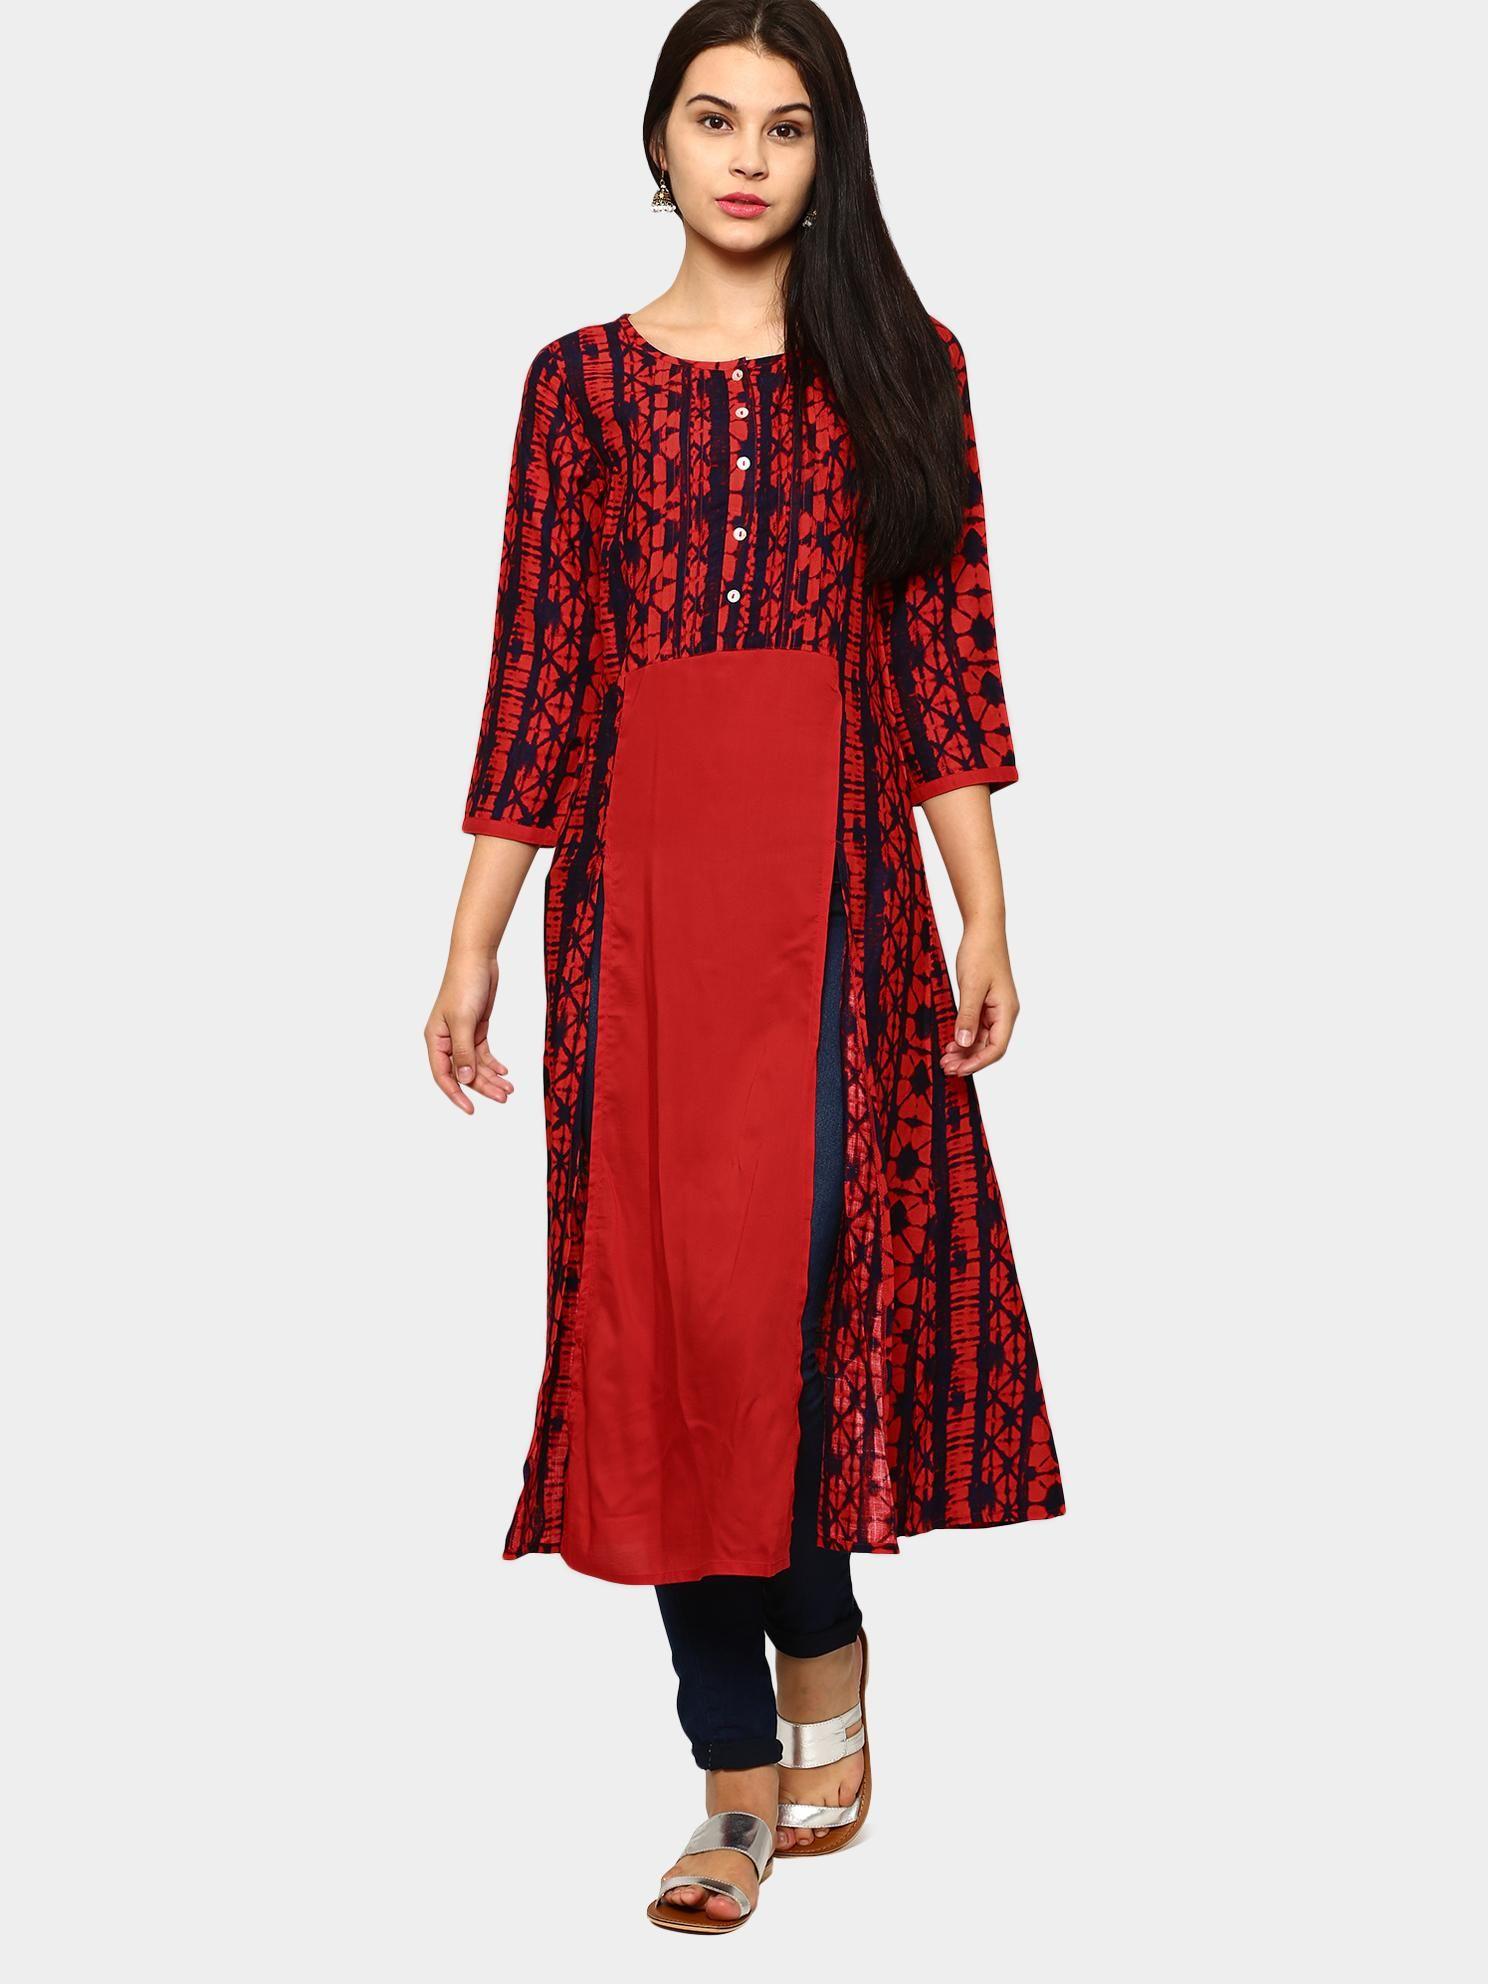 4c0827e65d1 Akkriti by Pantaloons Red Liva Printed Regular Fit Kurta